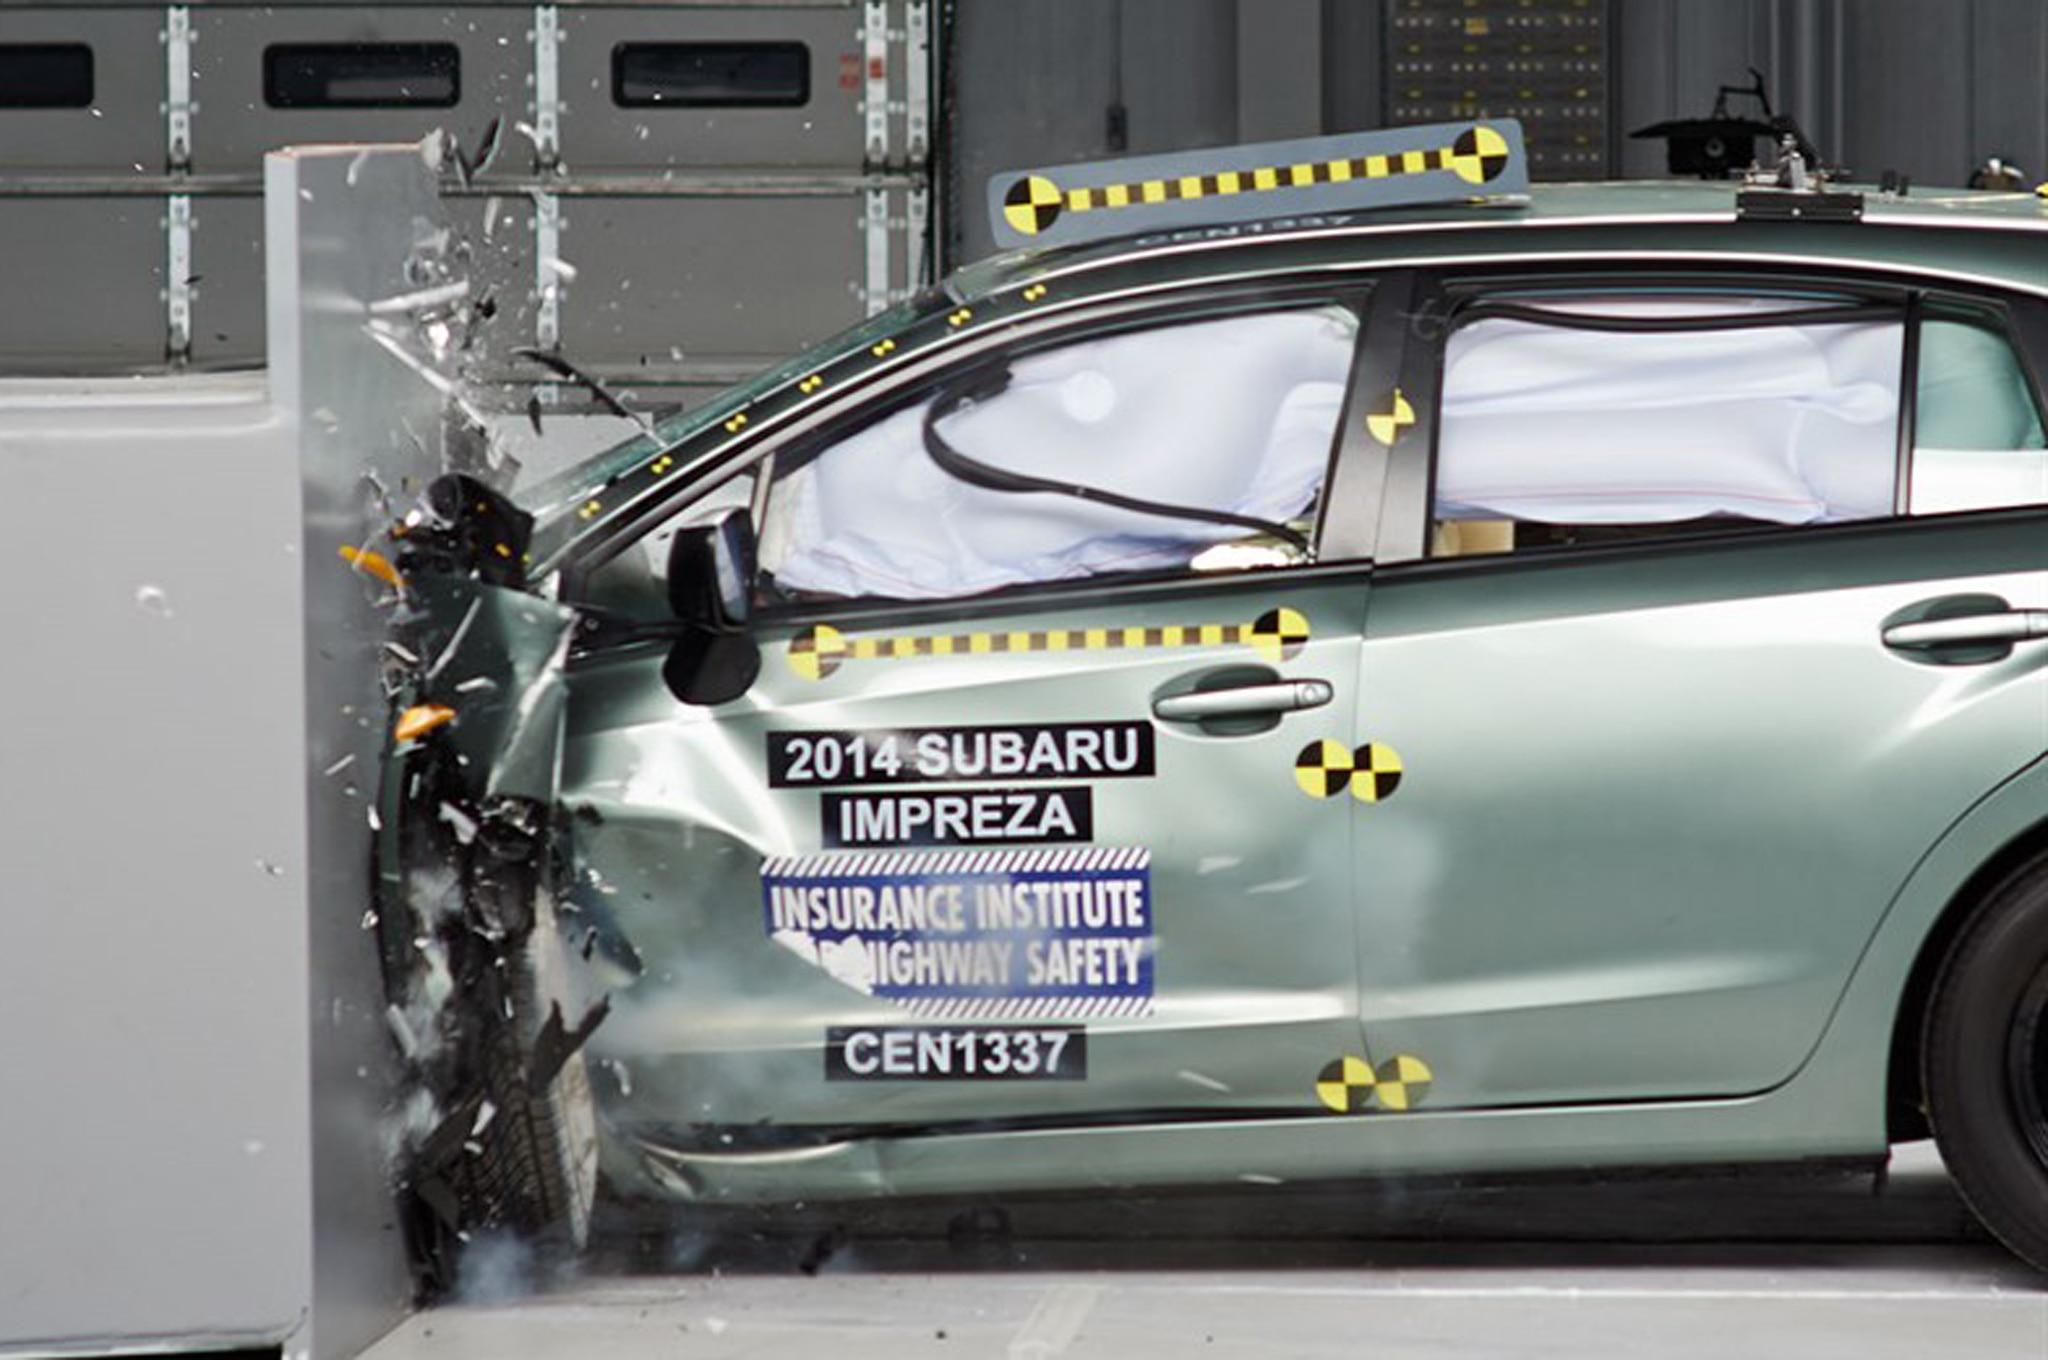 2014 Subaru Impreza Crash Test 21